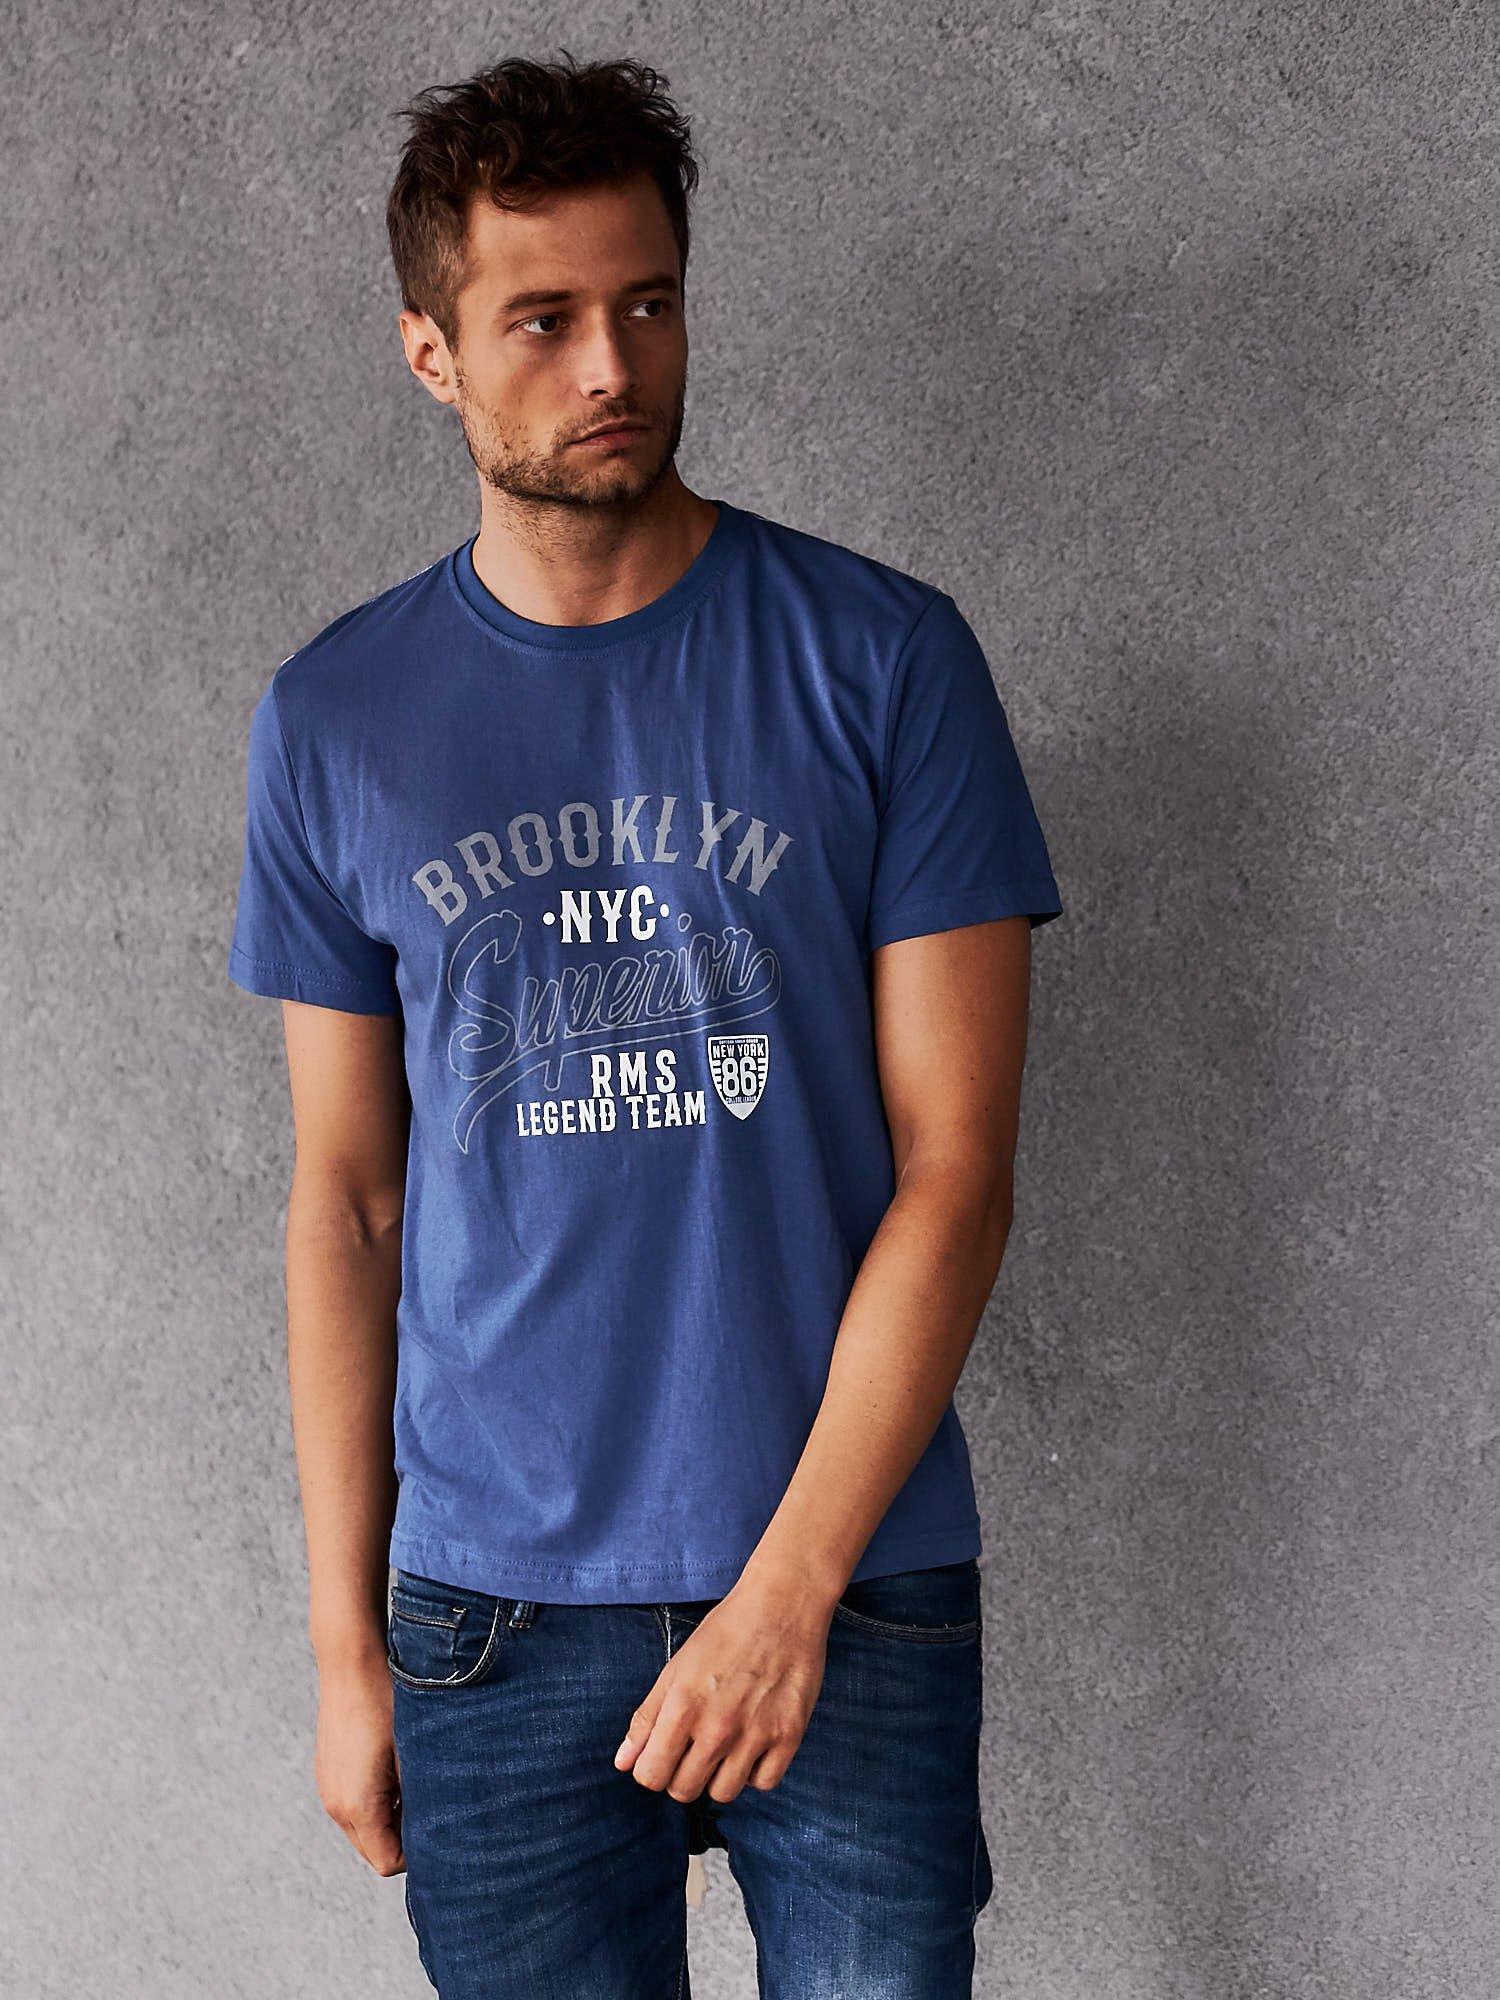 Ciemnoniebieski t-shirt męski z napisem BROOKLYN NYC                                  zdj.                                  1